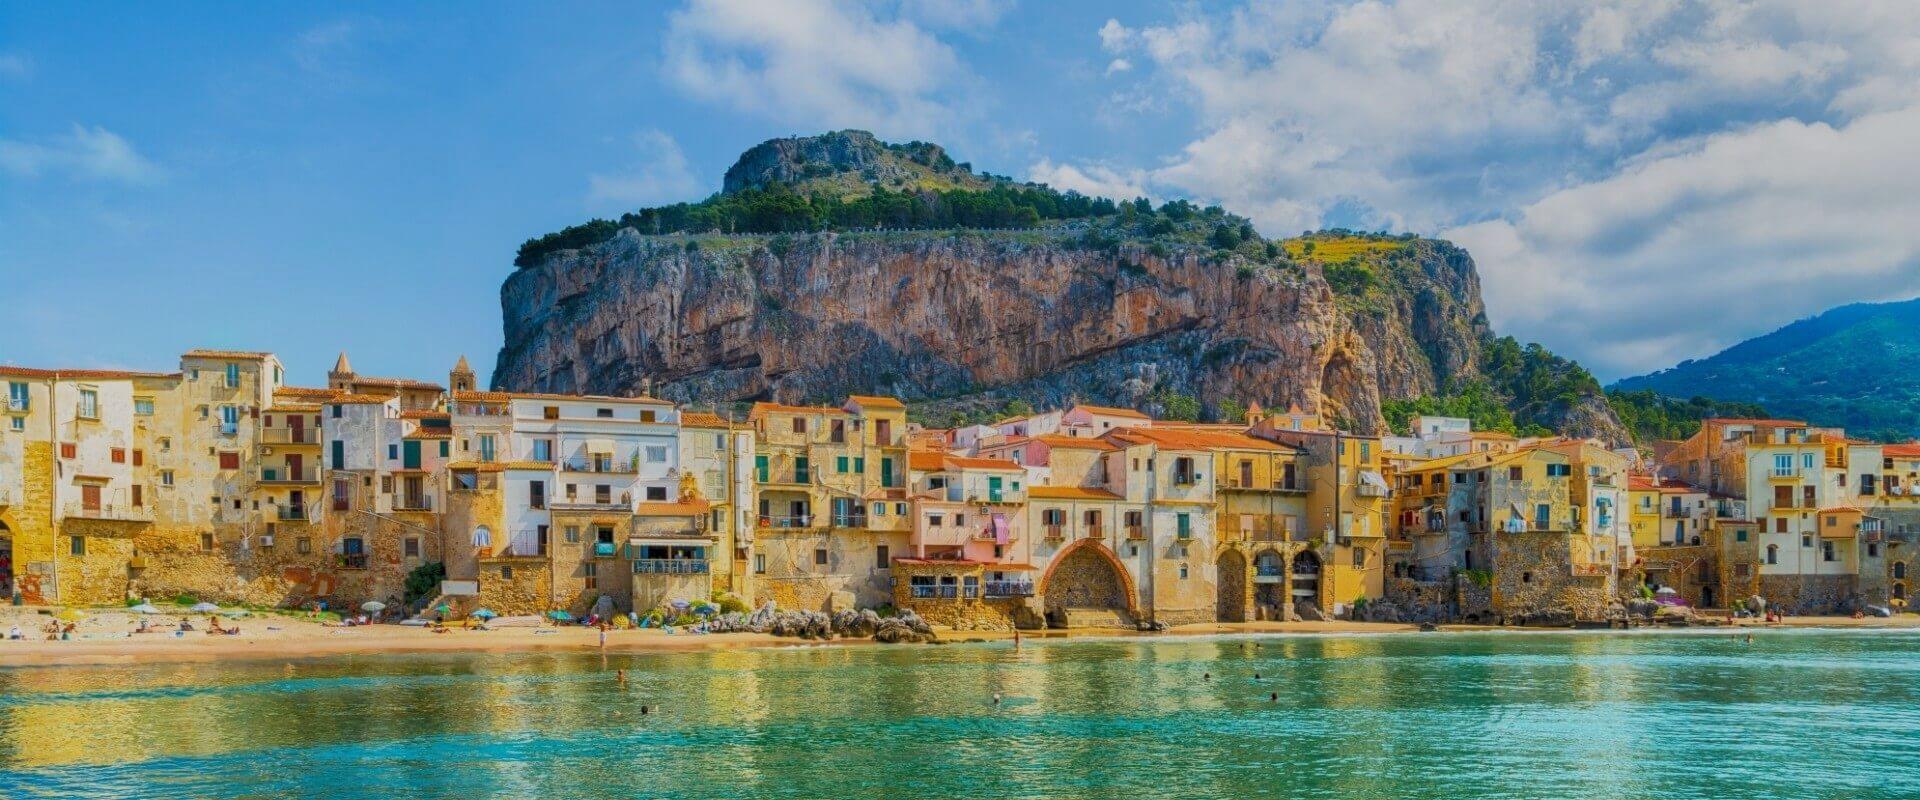 Sicily Coastal town